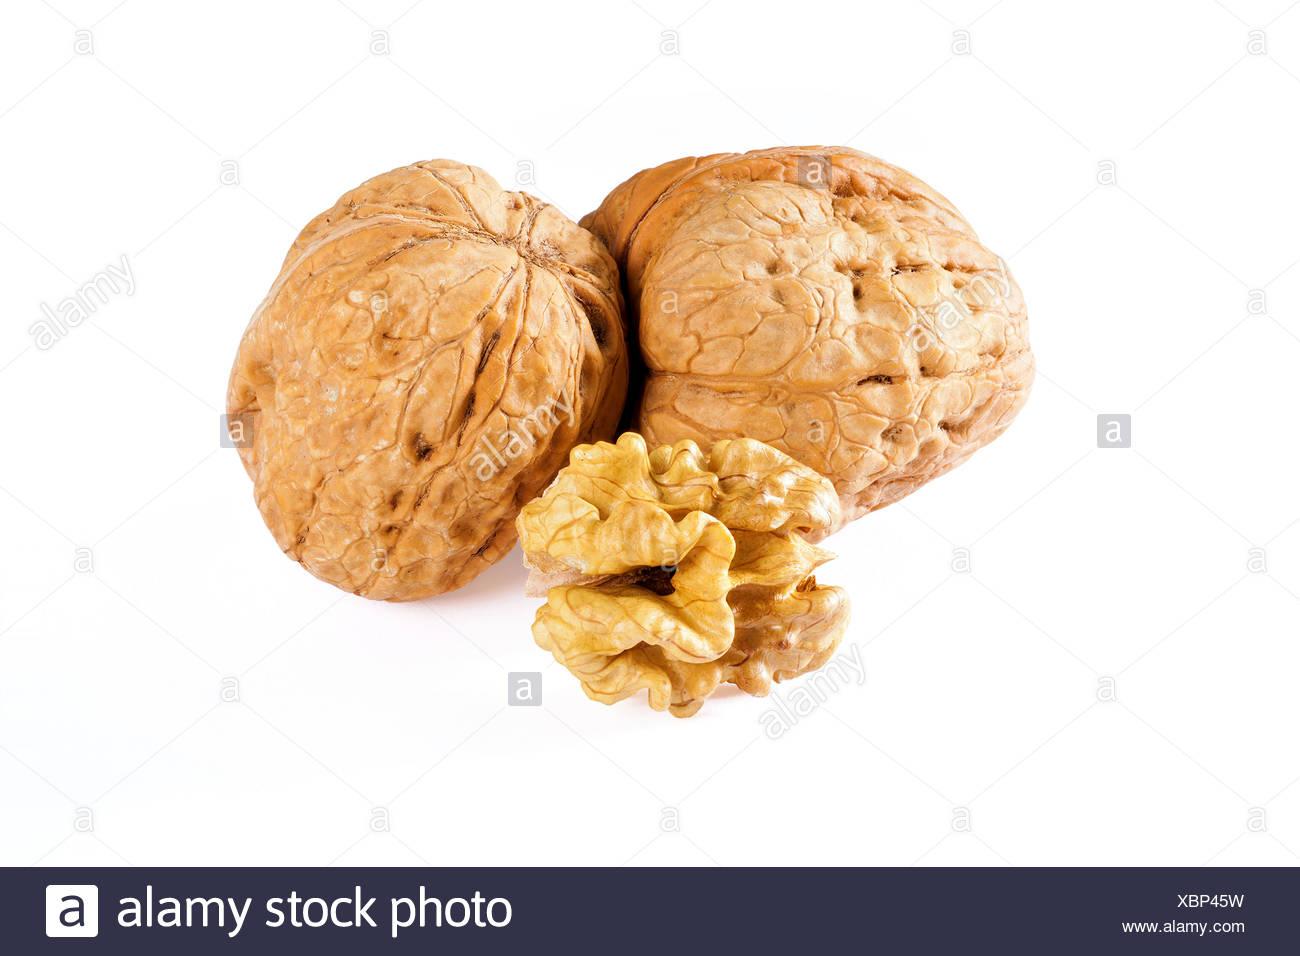 walnuts and walnut kernel - Stock Image